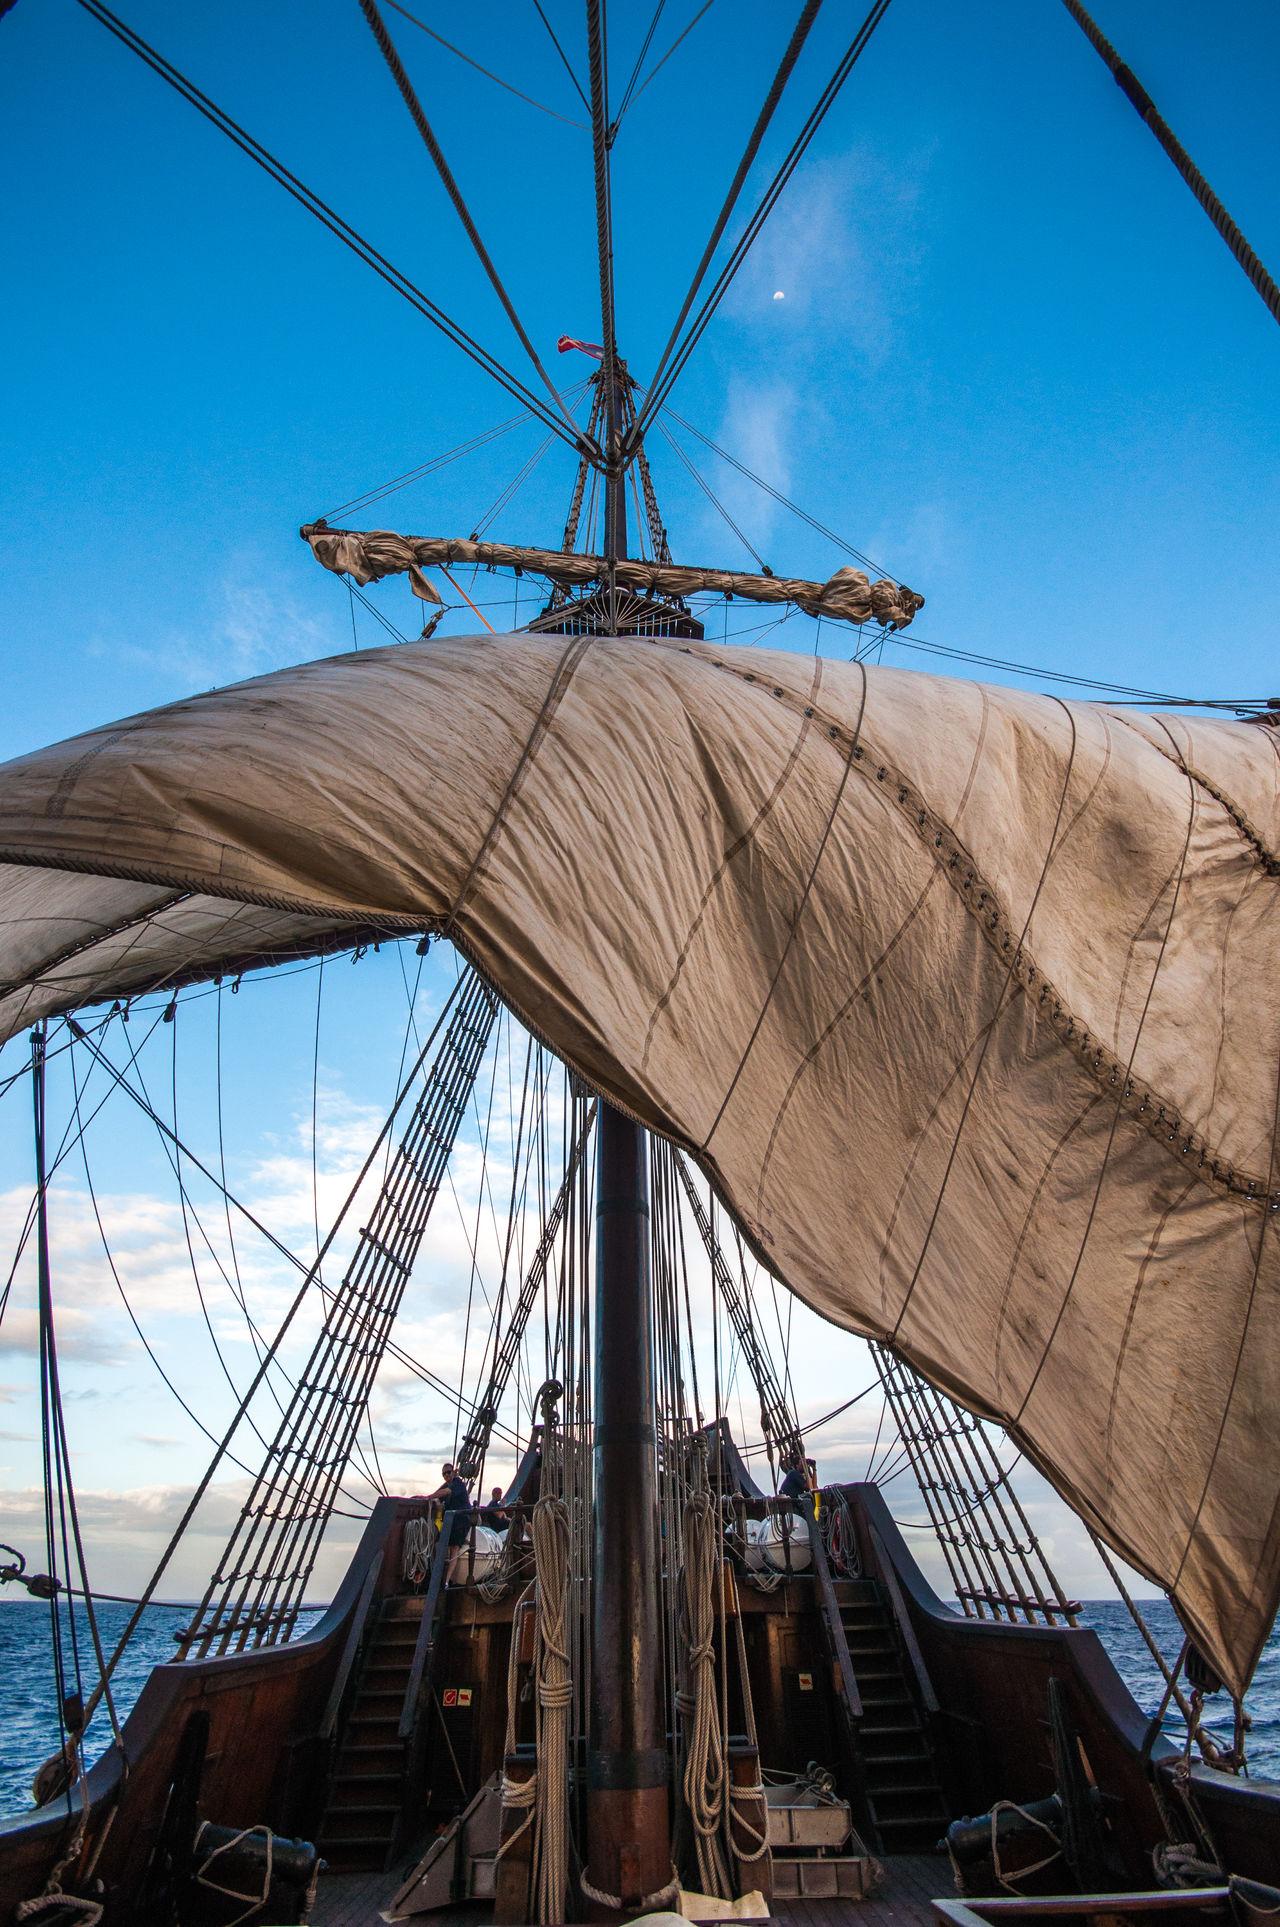 Day Galleon Mast Nautical Equipment Nautical Vessel No People Outdoors Pirate Pirates Pirateship  Rigging Sail Sailboat Sailing Sailing Ship Sailing Ship Ship Sky Tall Ship Tall Ship Transportation Travel Wood Ships XVIII. Century